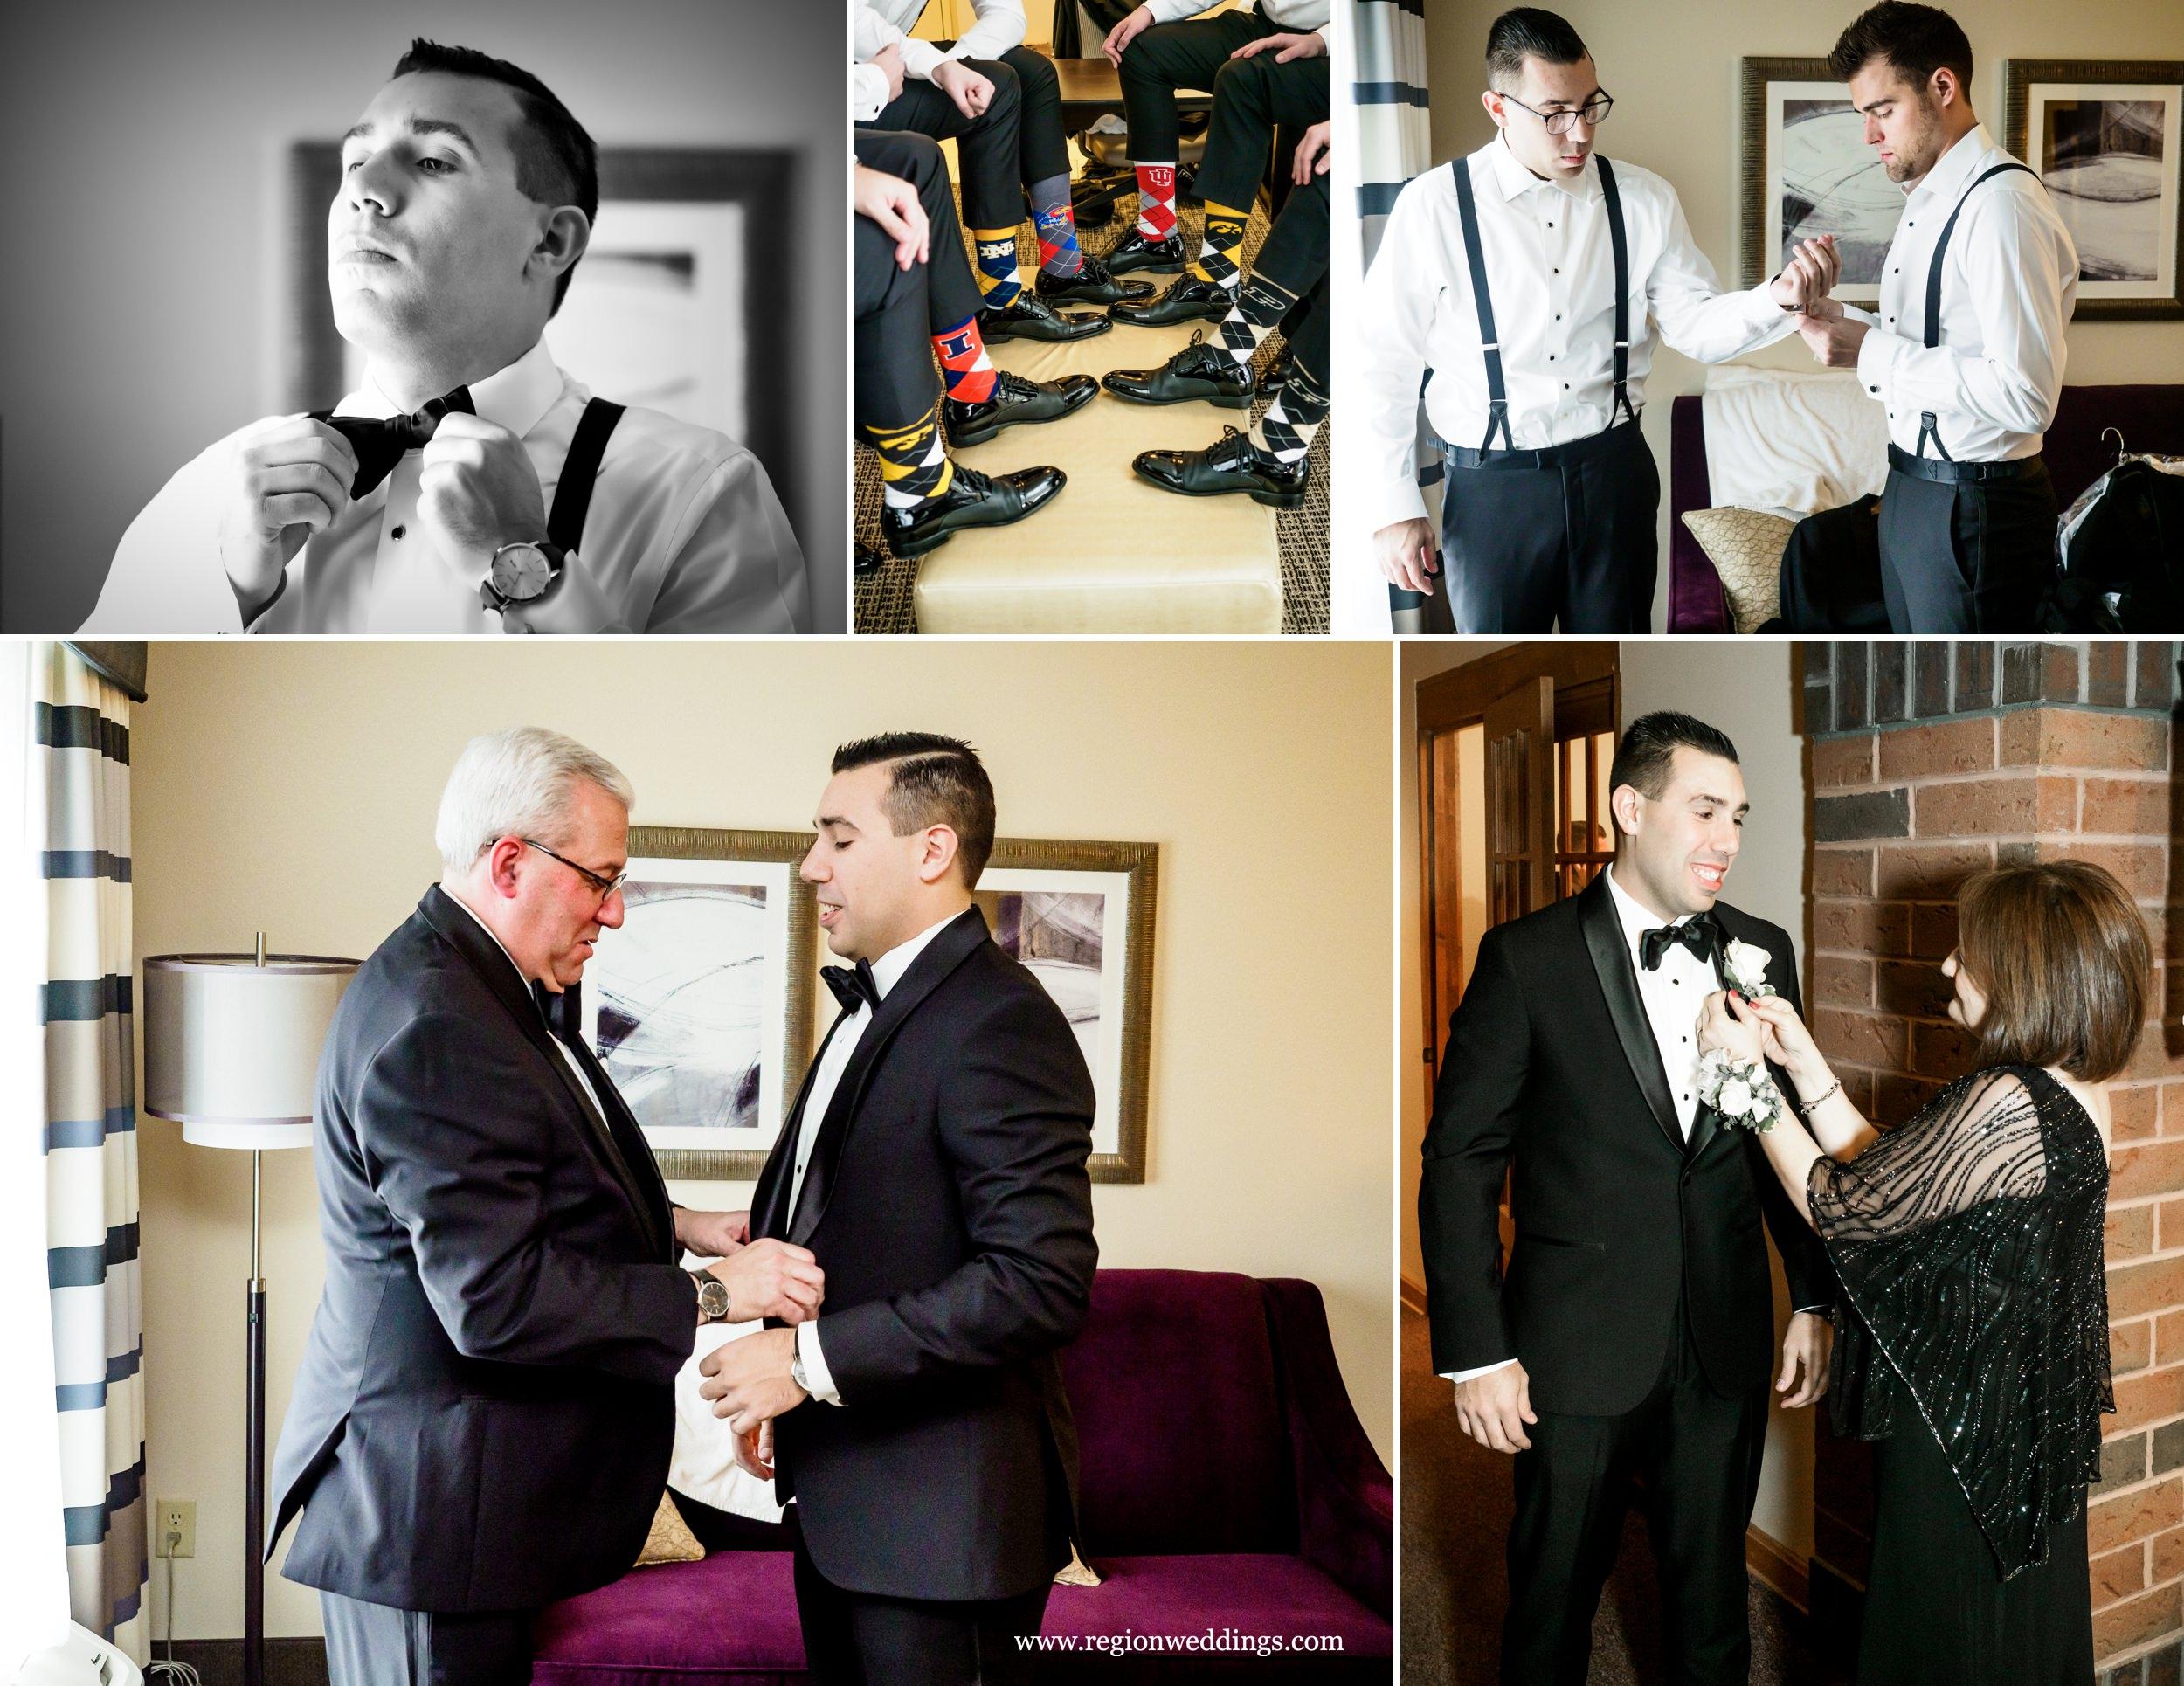 Groomsmen prep for a December wedding.